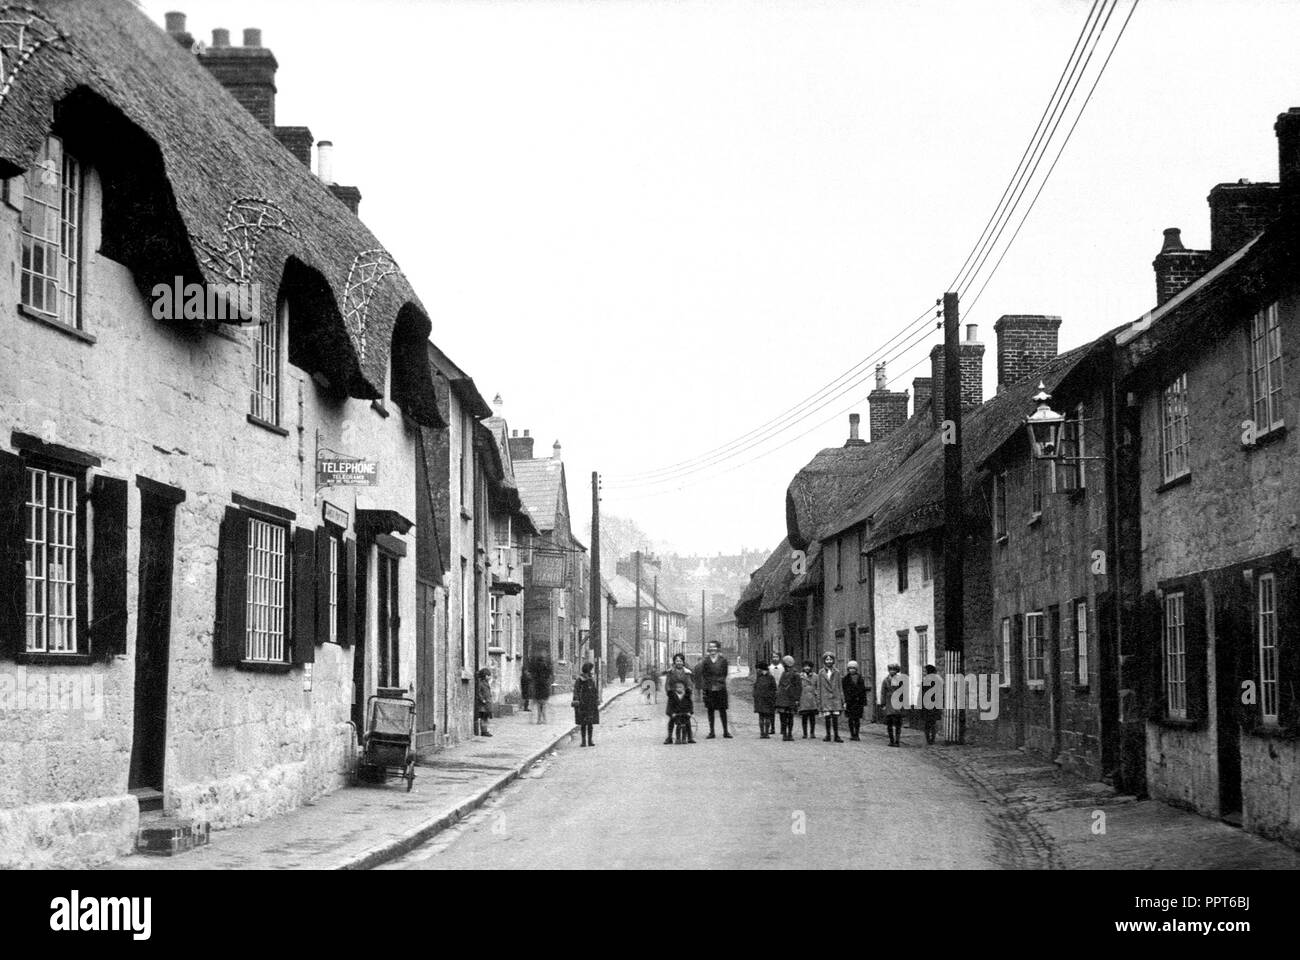 Shaftesbury early 1900's - Stock Image